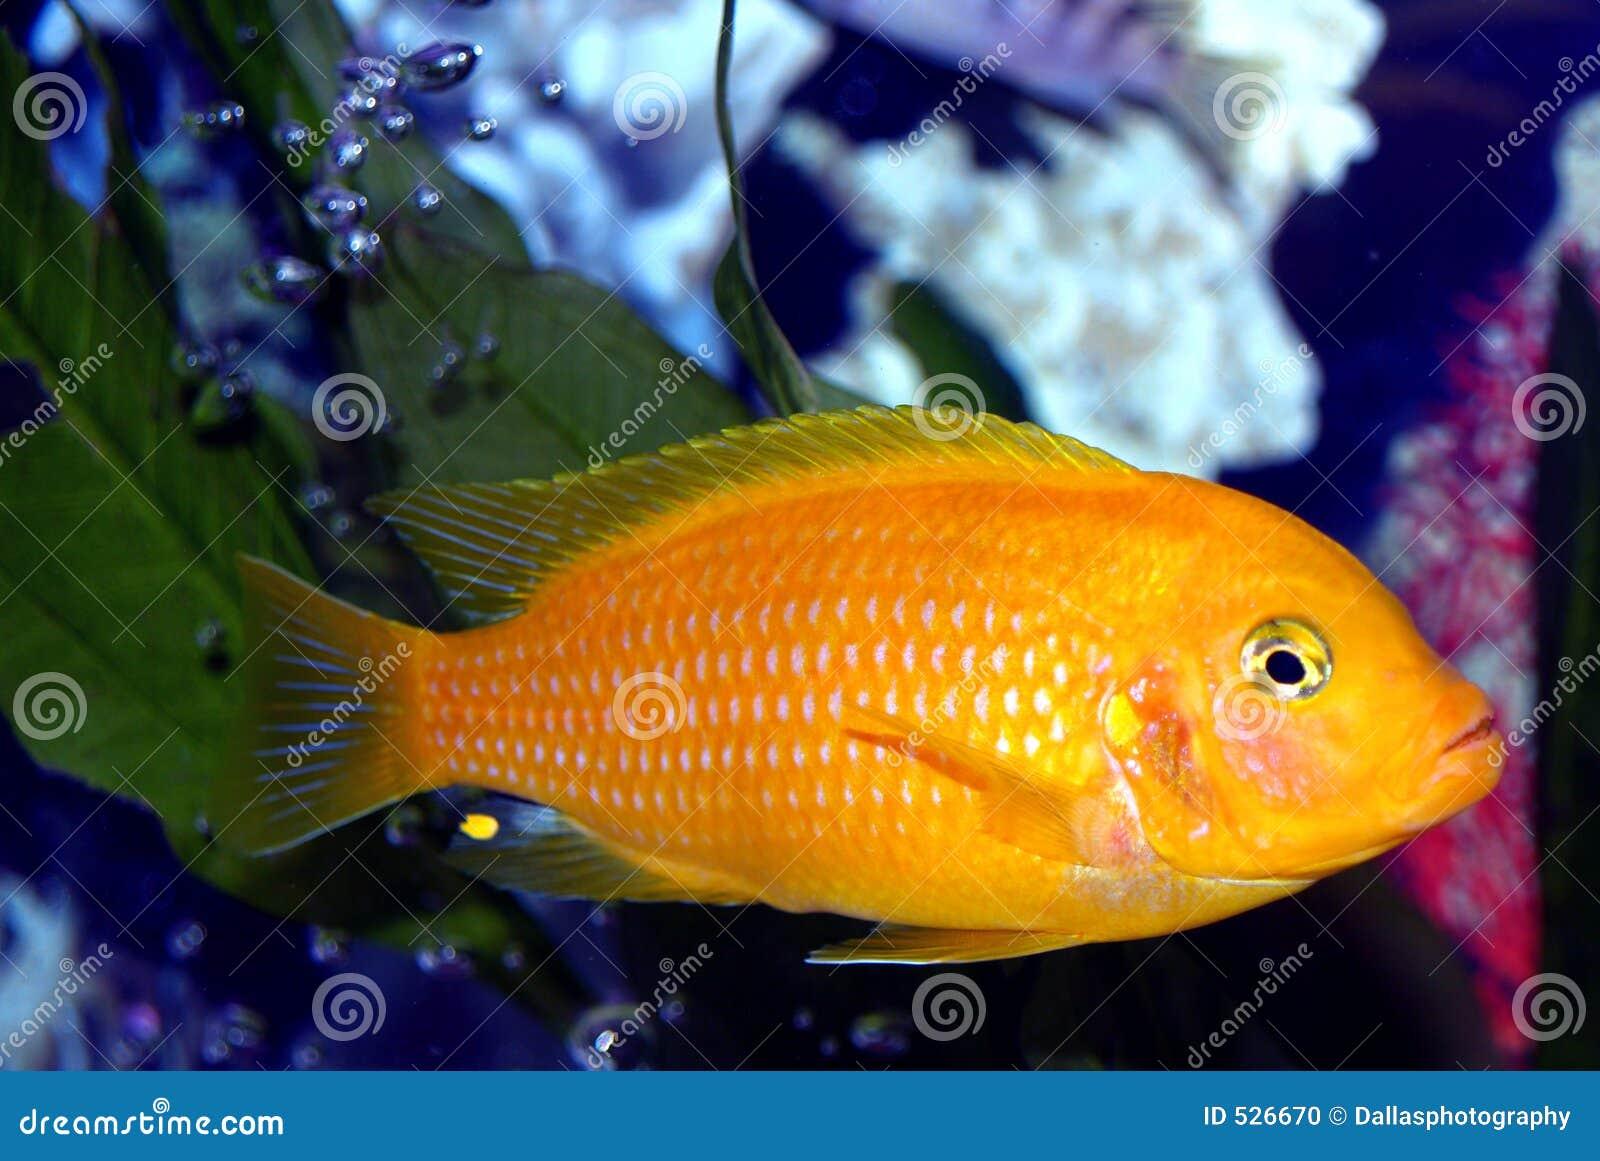 Kenyi masculino, peixe tropical